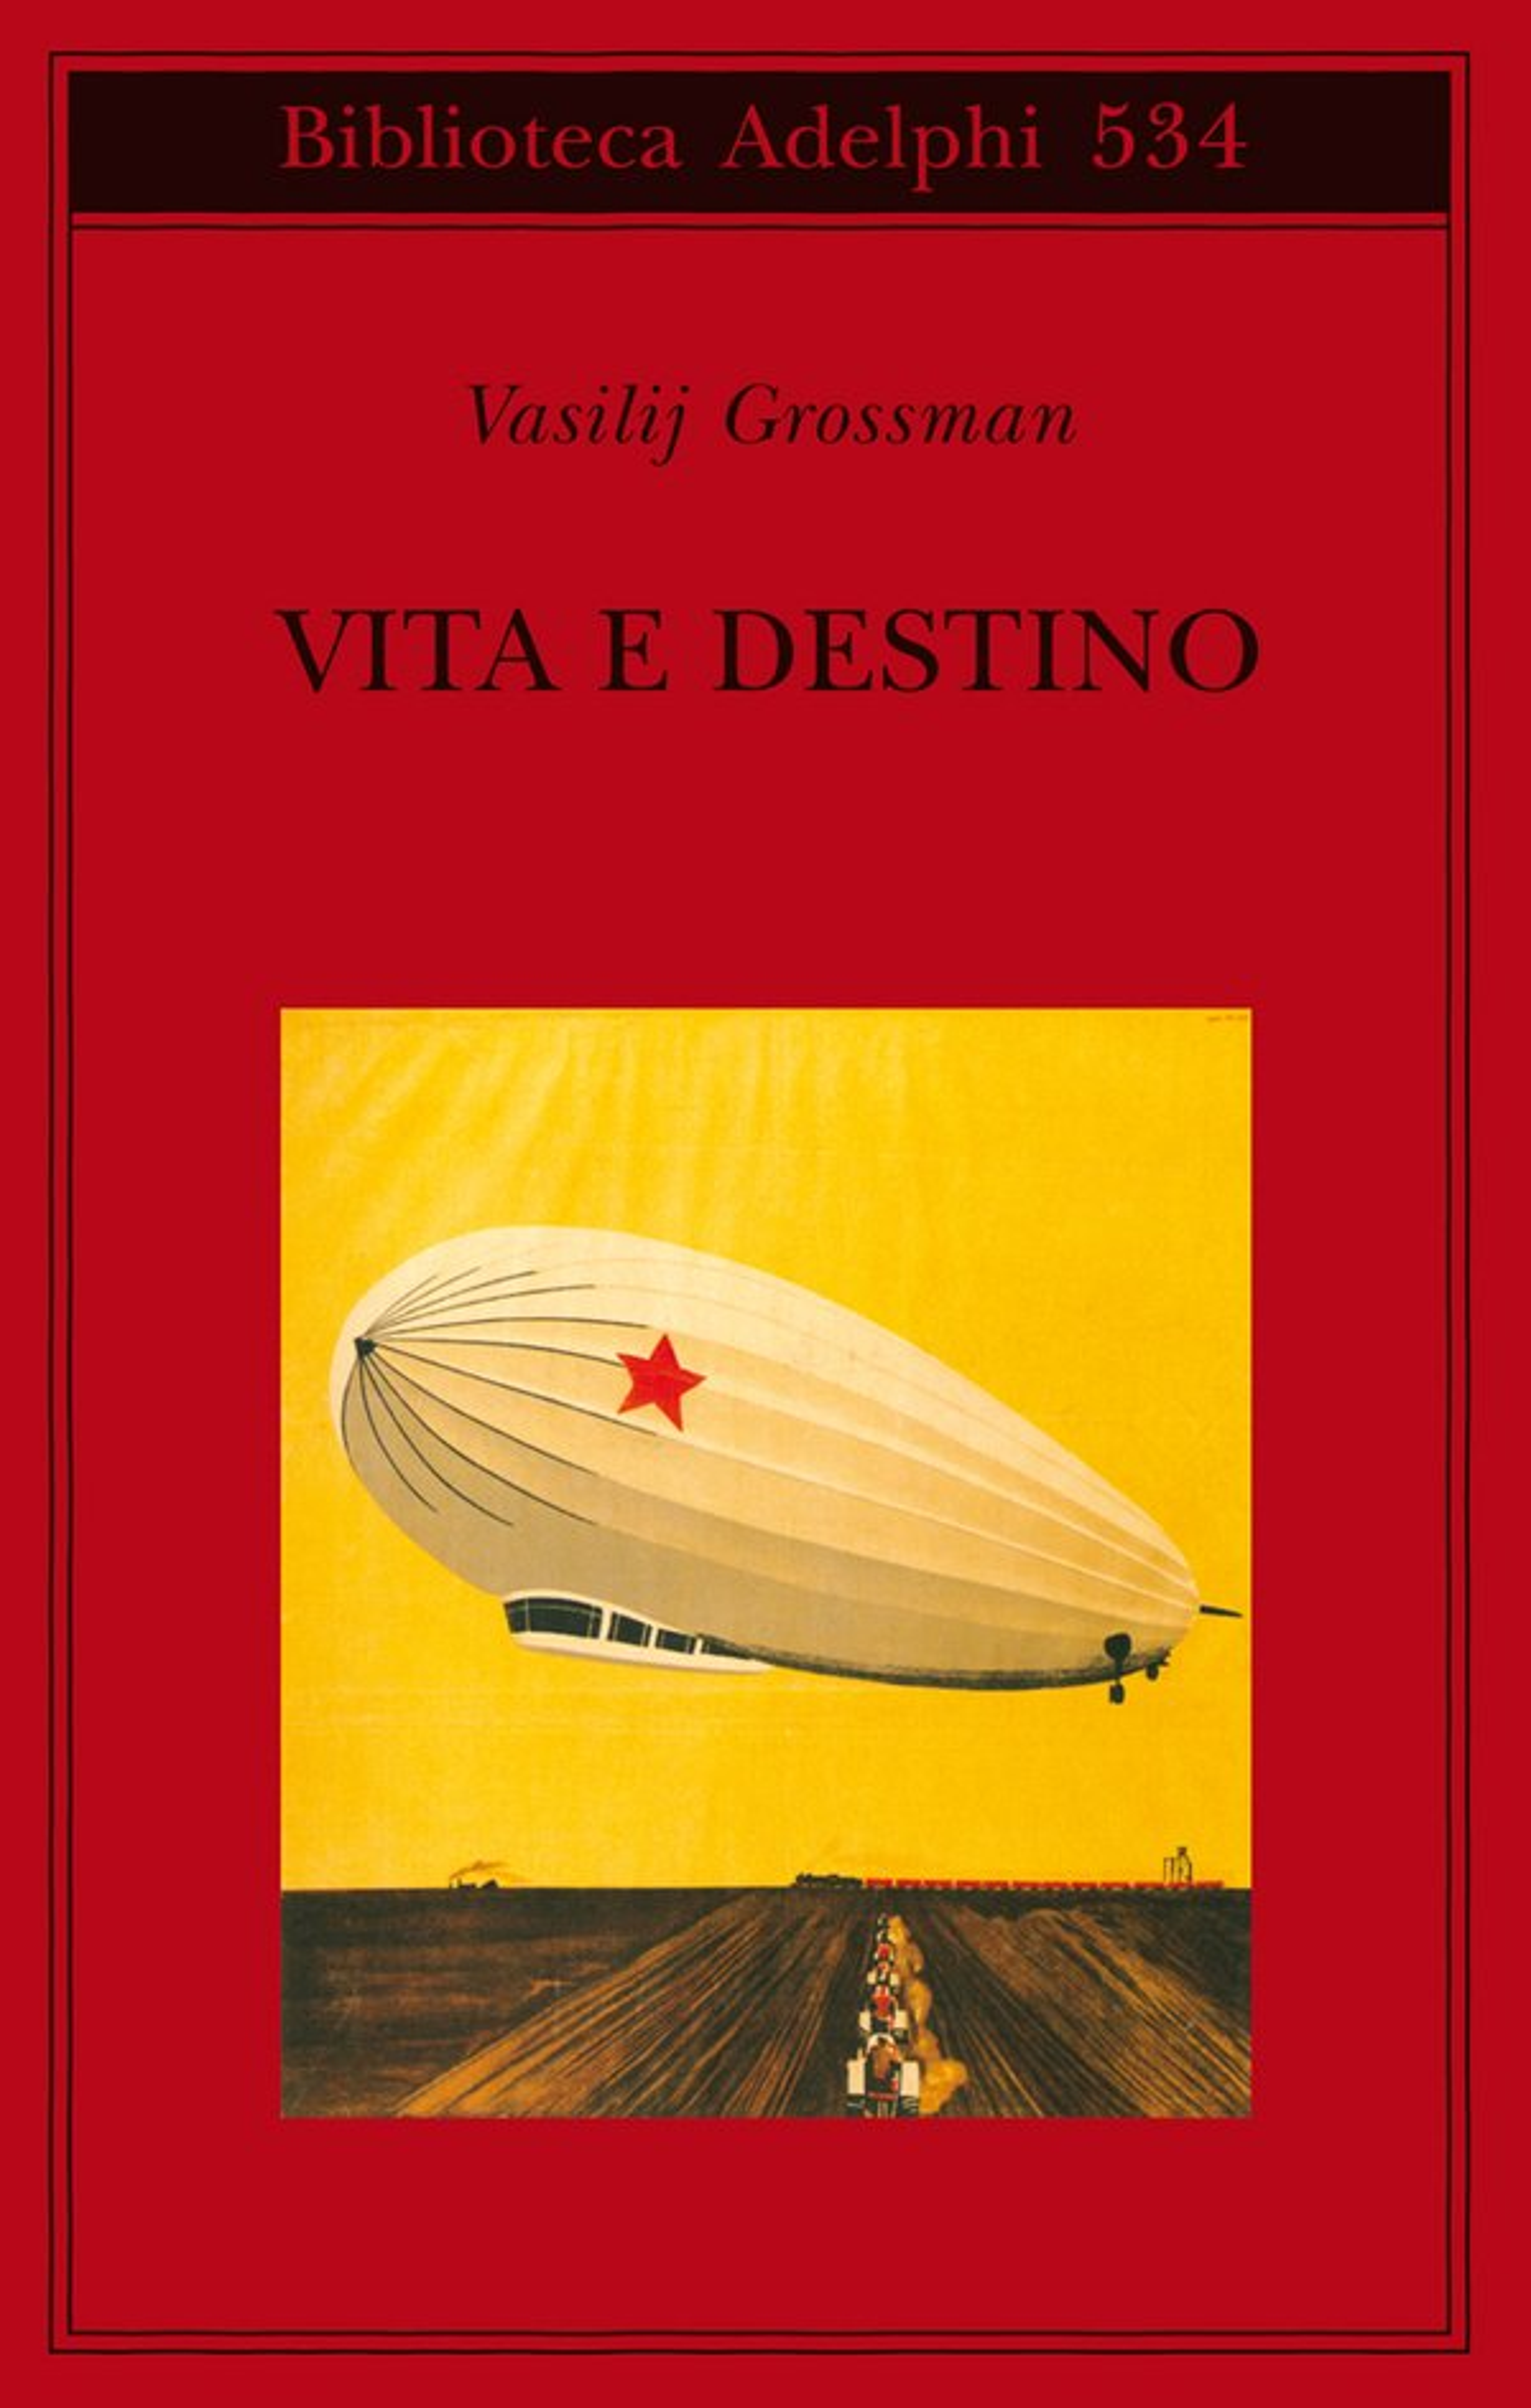 Vasilij Grossman, Vita e destino